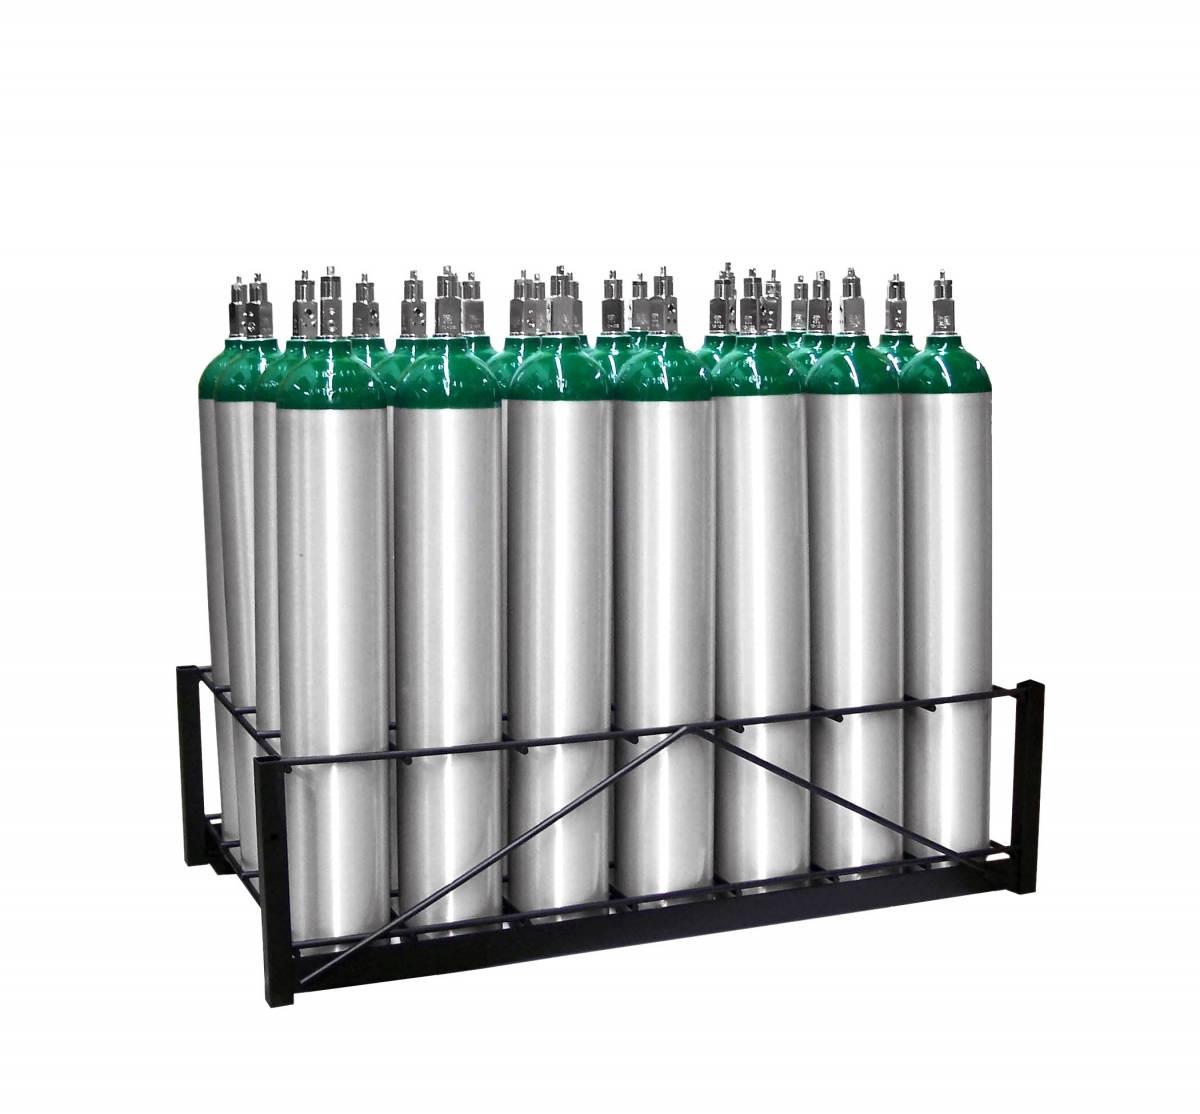 28 Cylinder D E M9 Rack